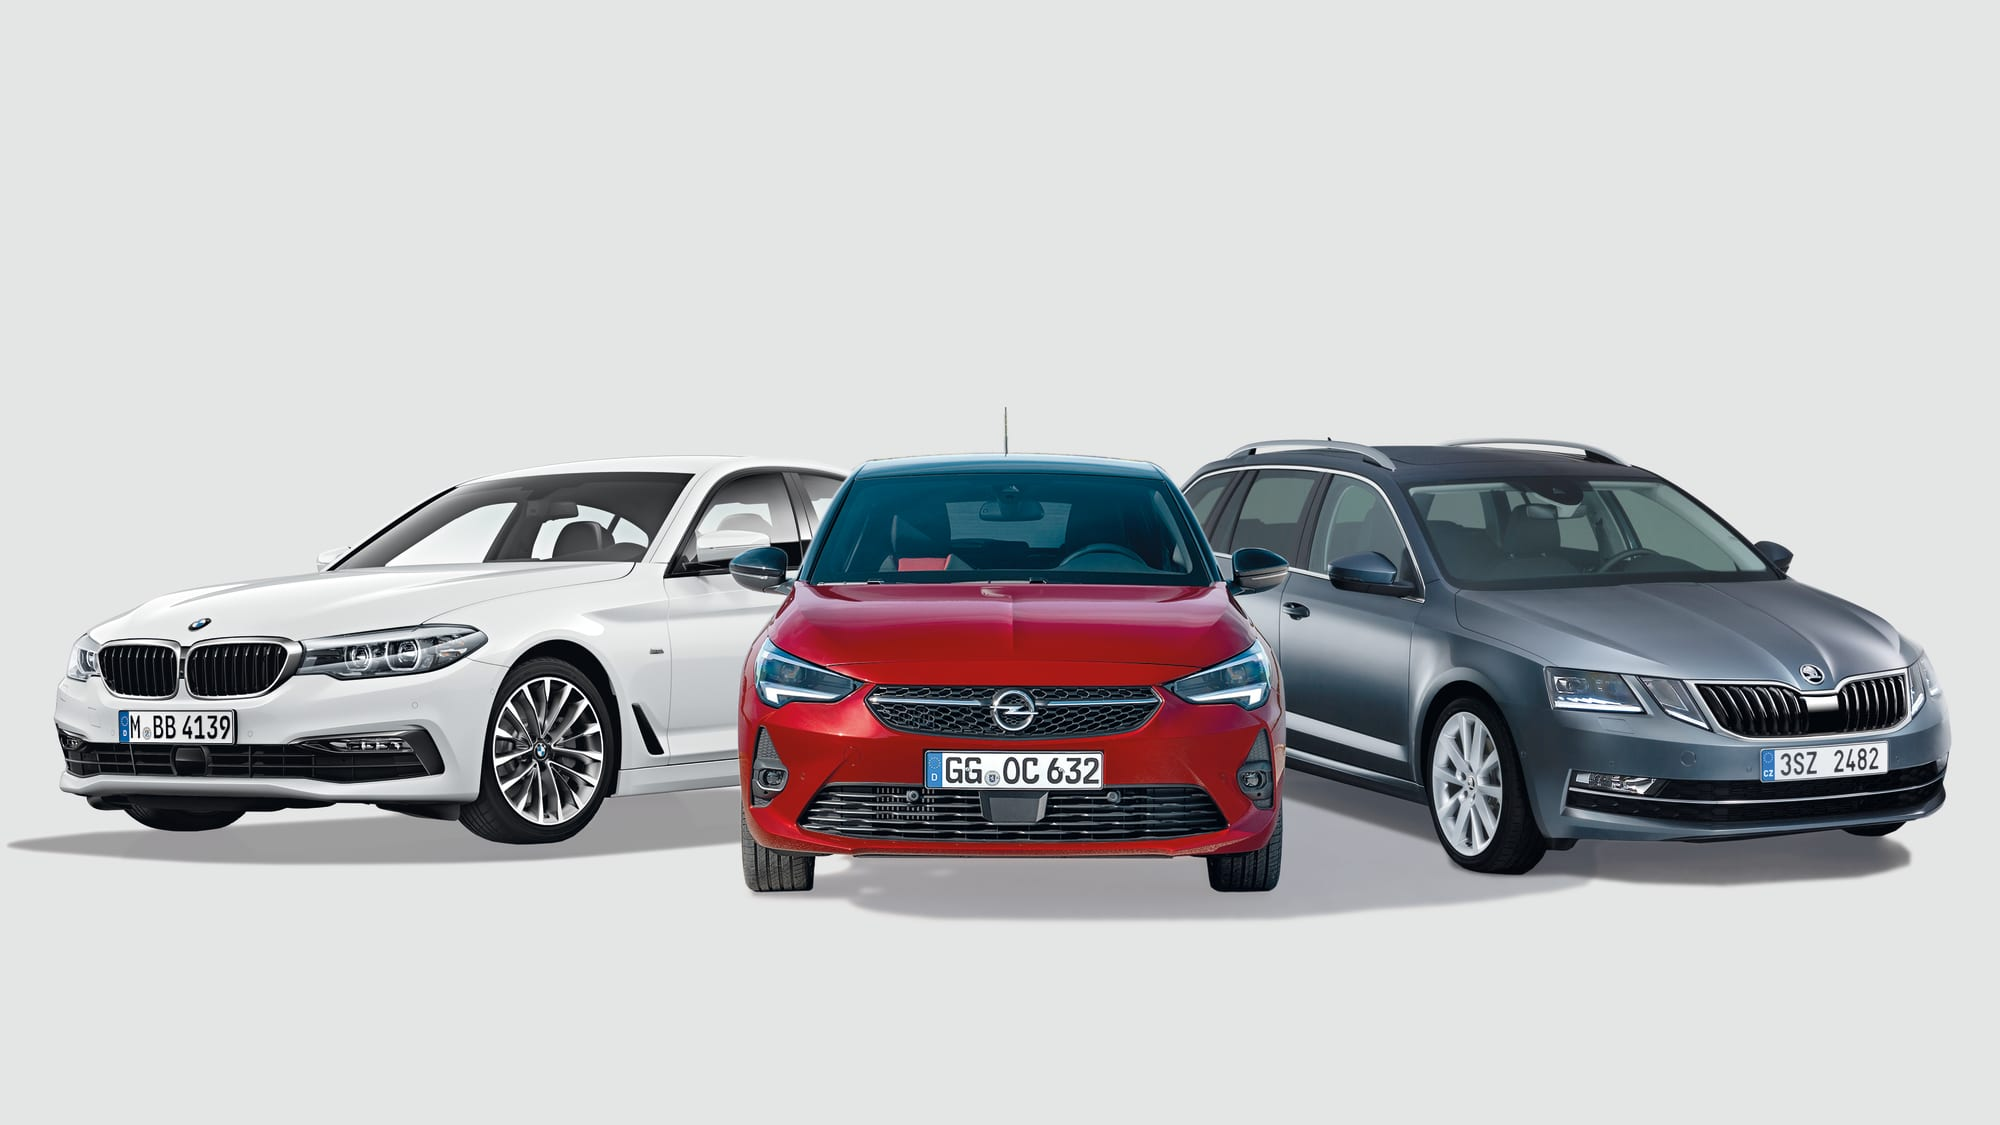 BMW 520d, Opel Corsa, Skoda Octavia Combi